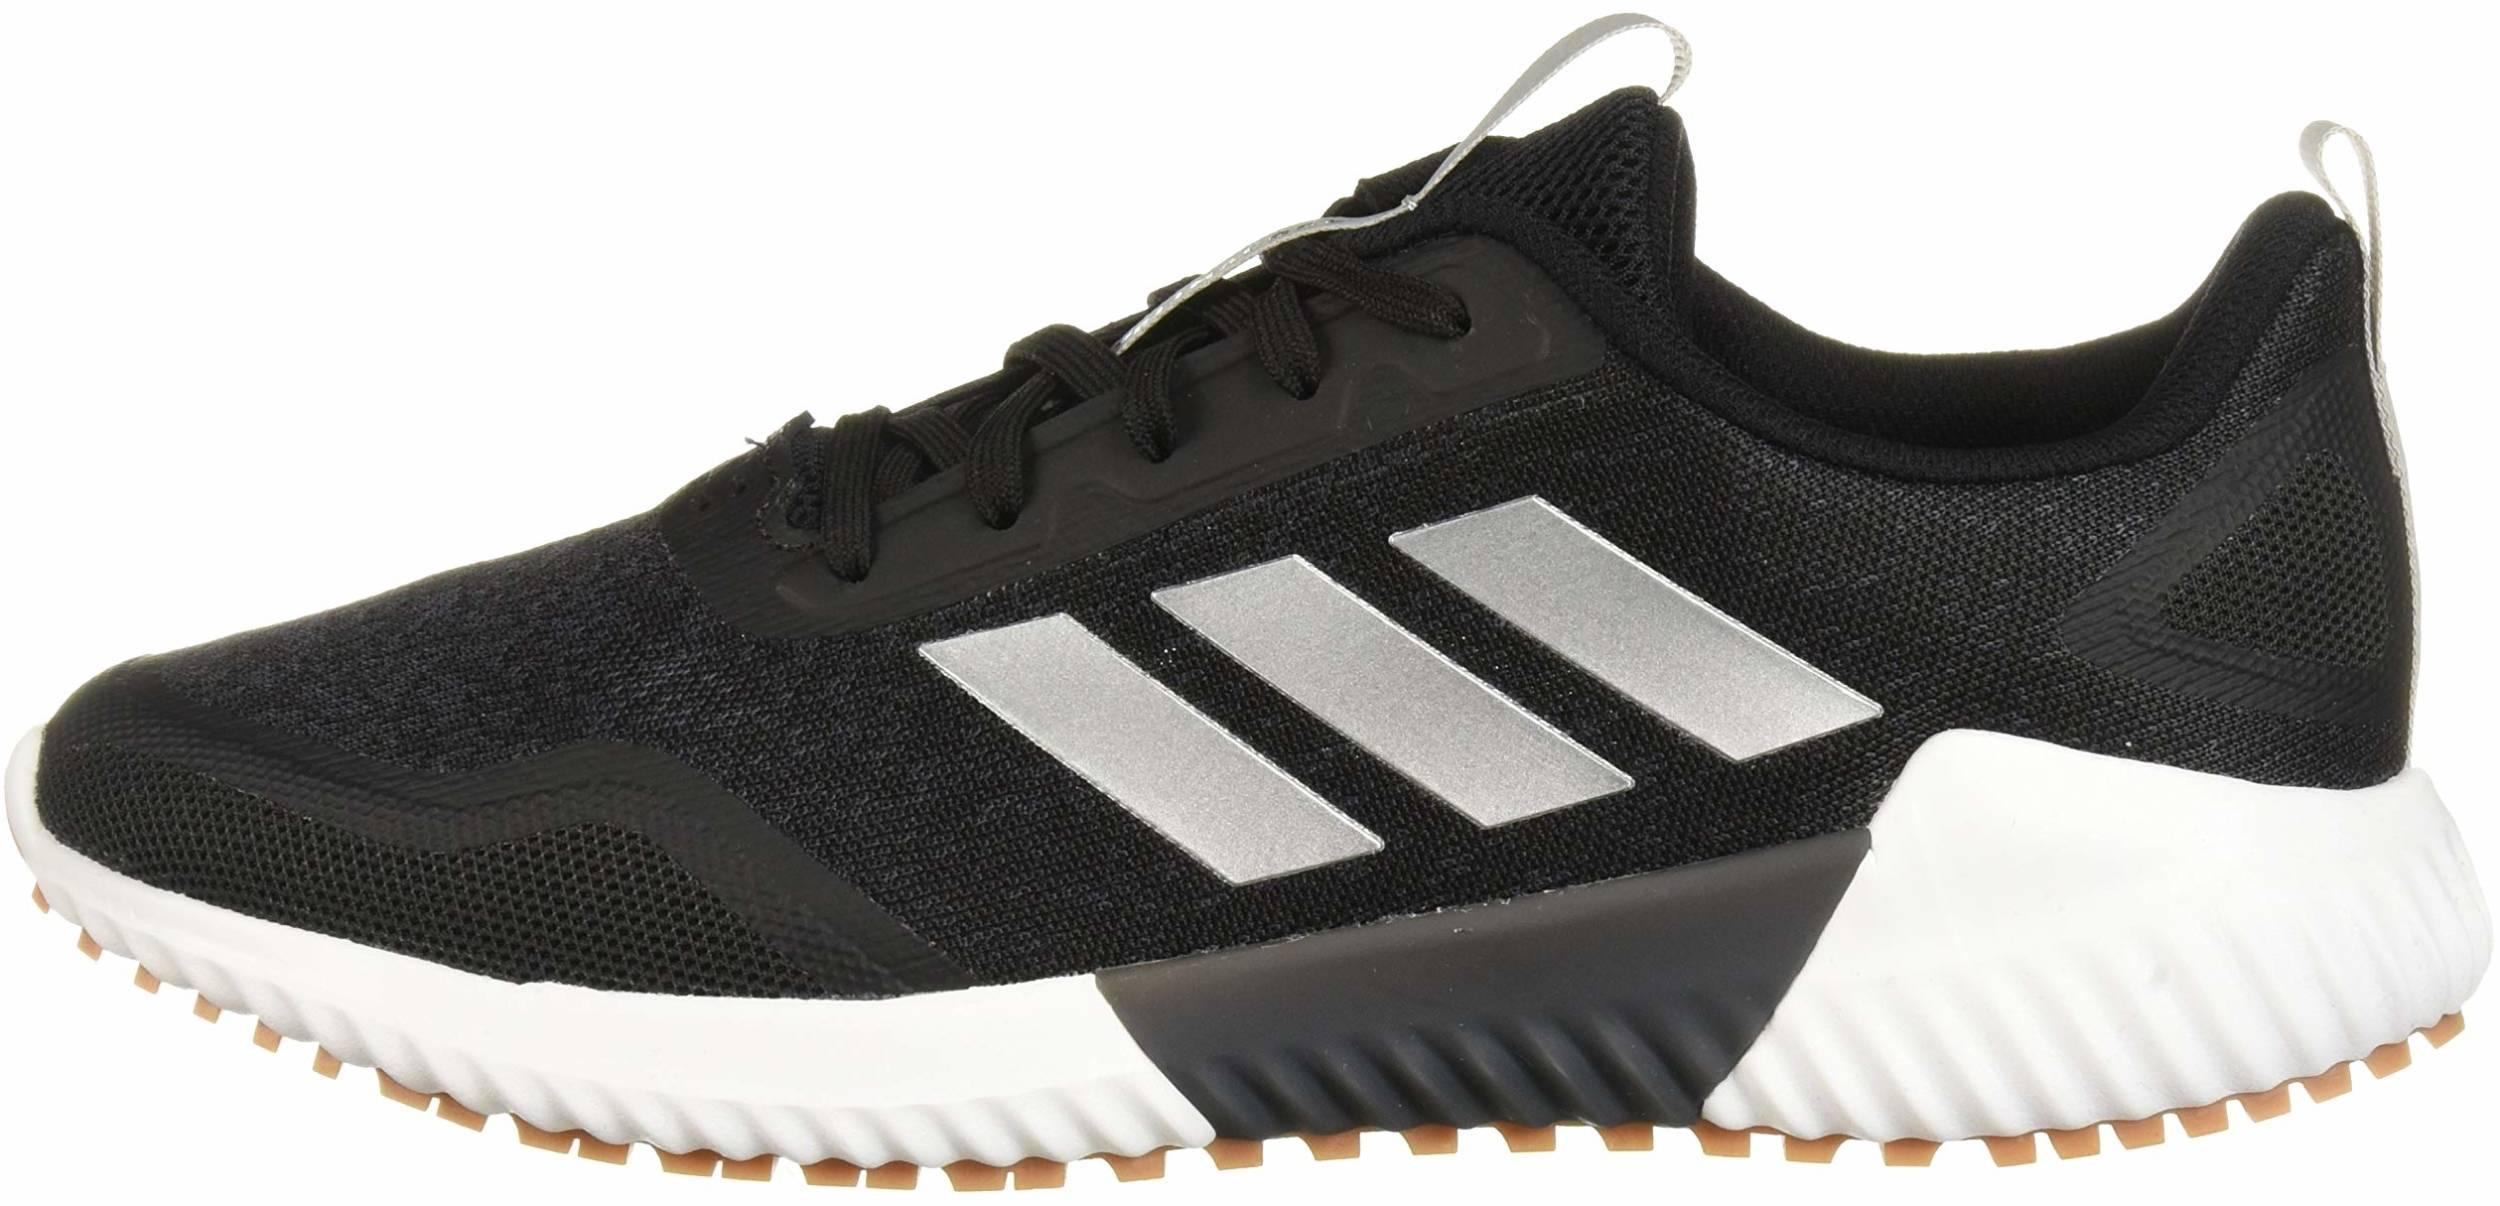 Adidas Edge Runner